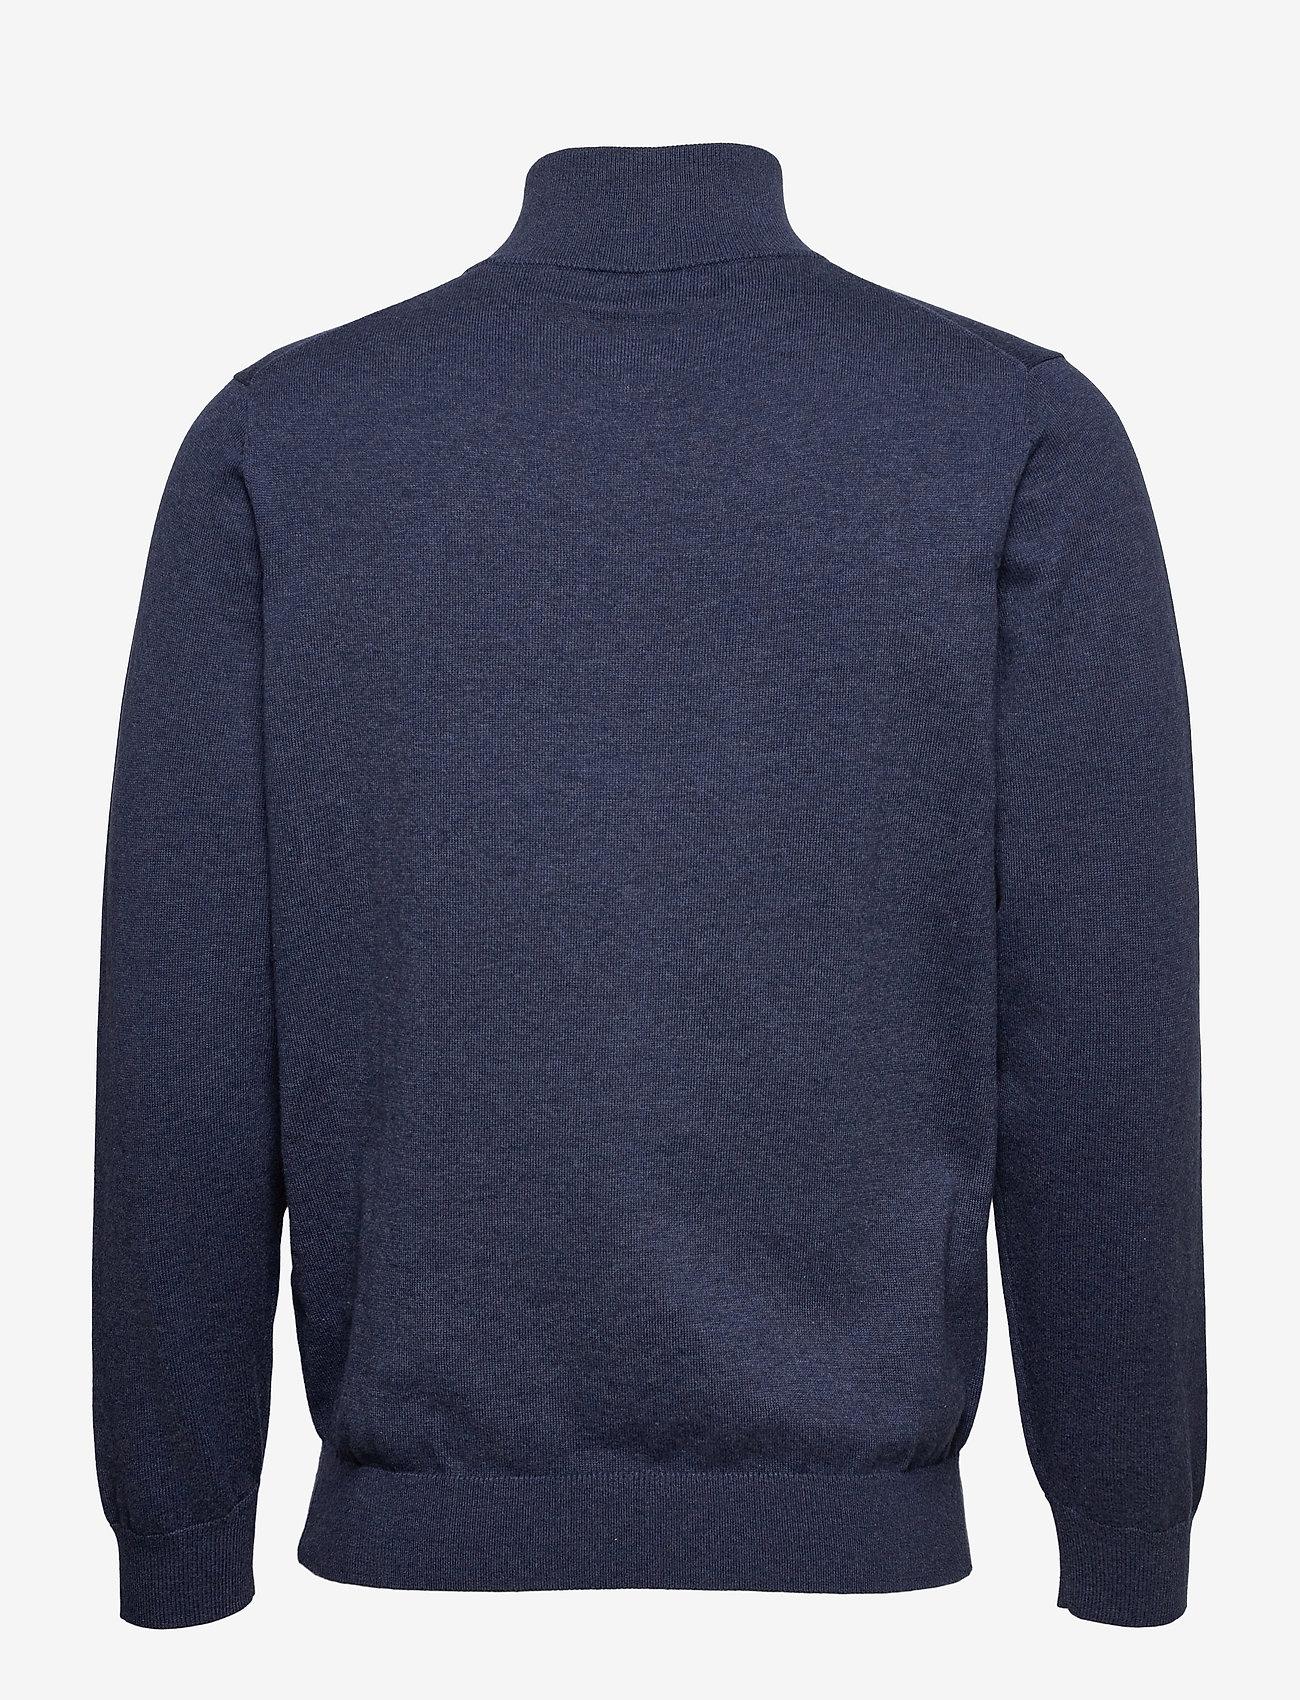 GANT - CLASSIC COTTON HALF ZIP - half zip - dark jeansblue melange - 1